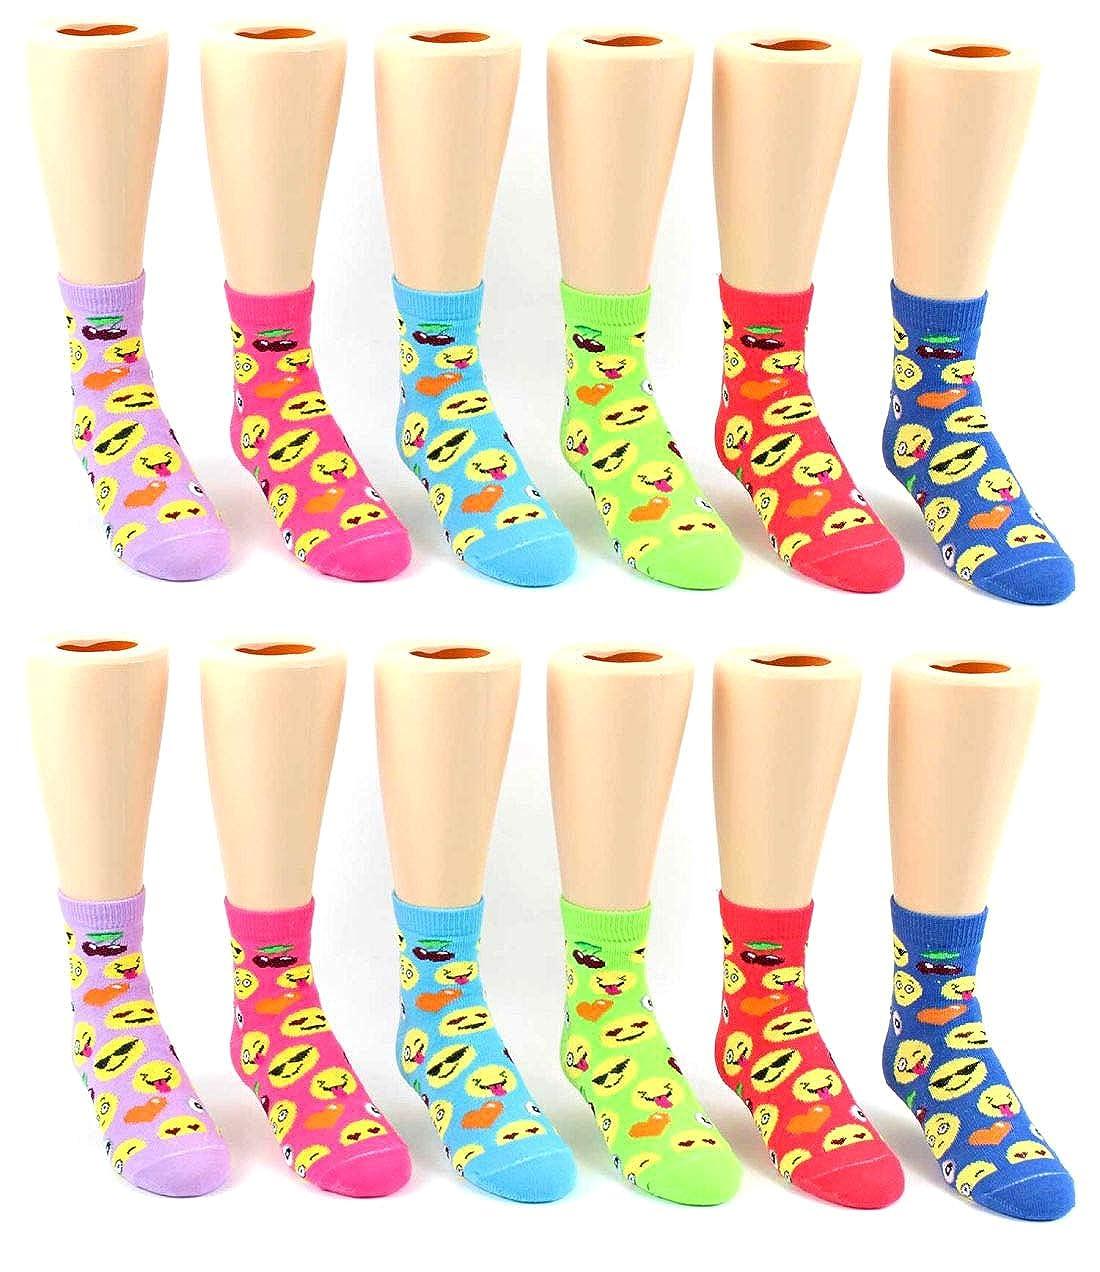 12 Pair Packs Bulk Childrens Styles Boys and Girls Party Socks